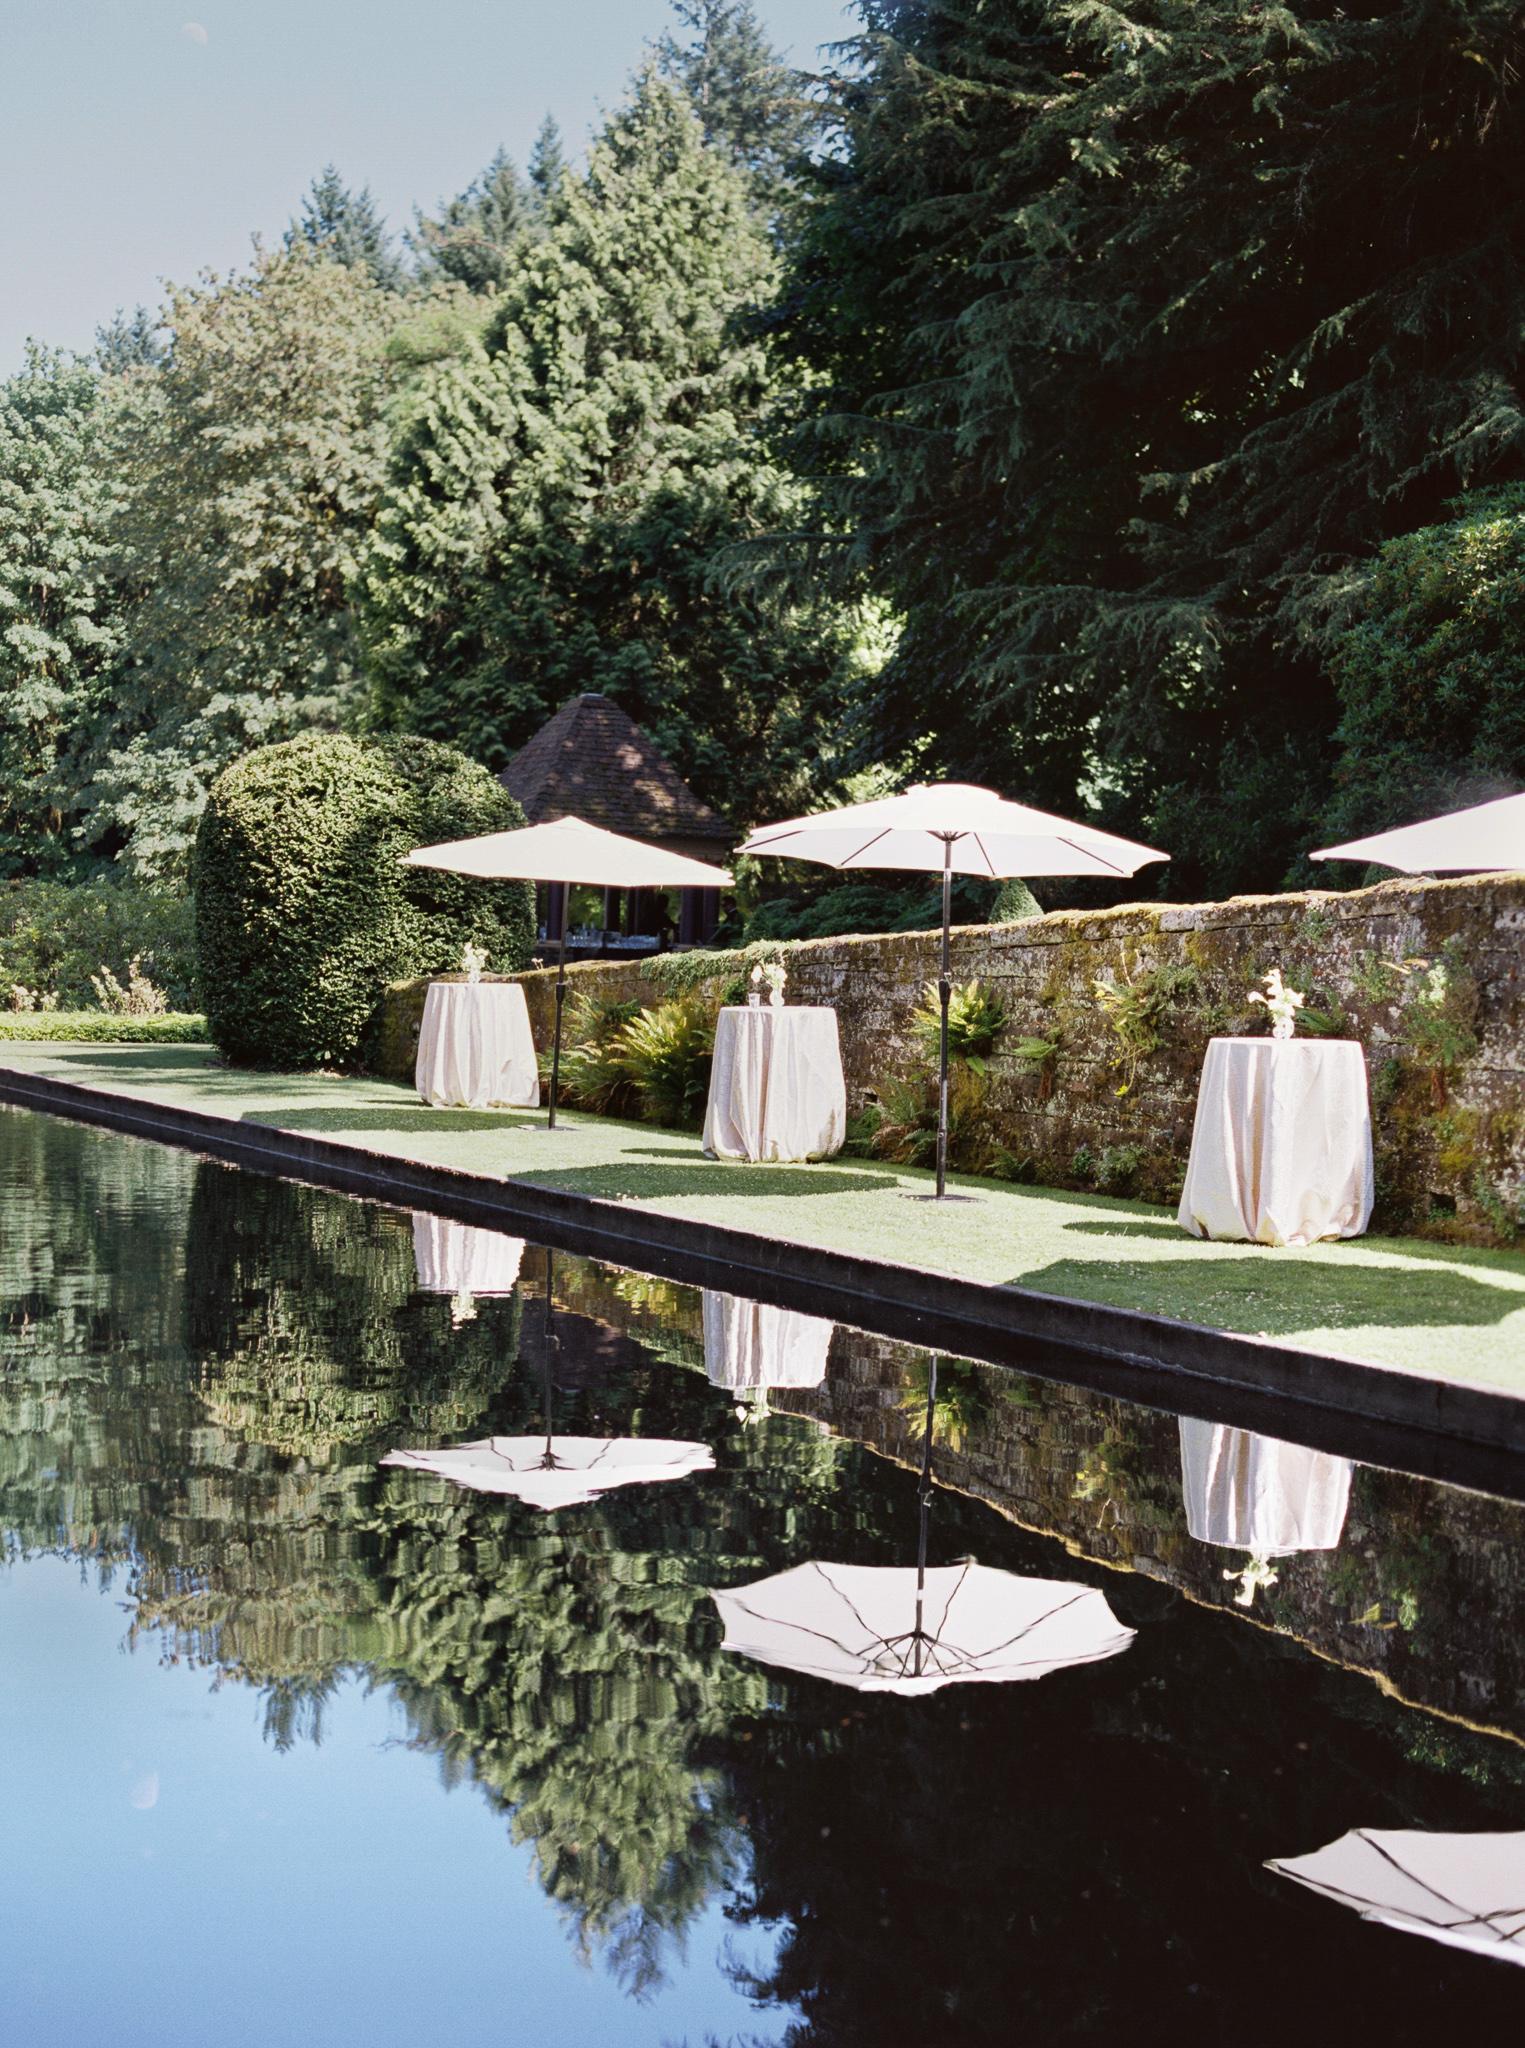 152OutliveCreative_Travel_Photographer_Videographer_Lewis&Clark_Oregon_Elegant_BlackTie_Destination_Wedding.jpg